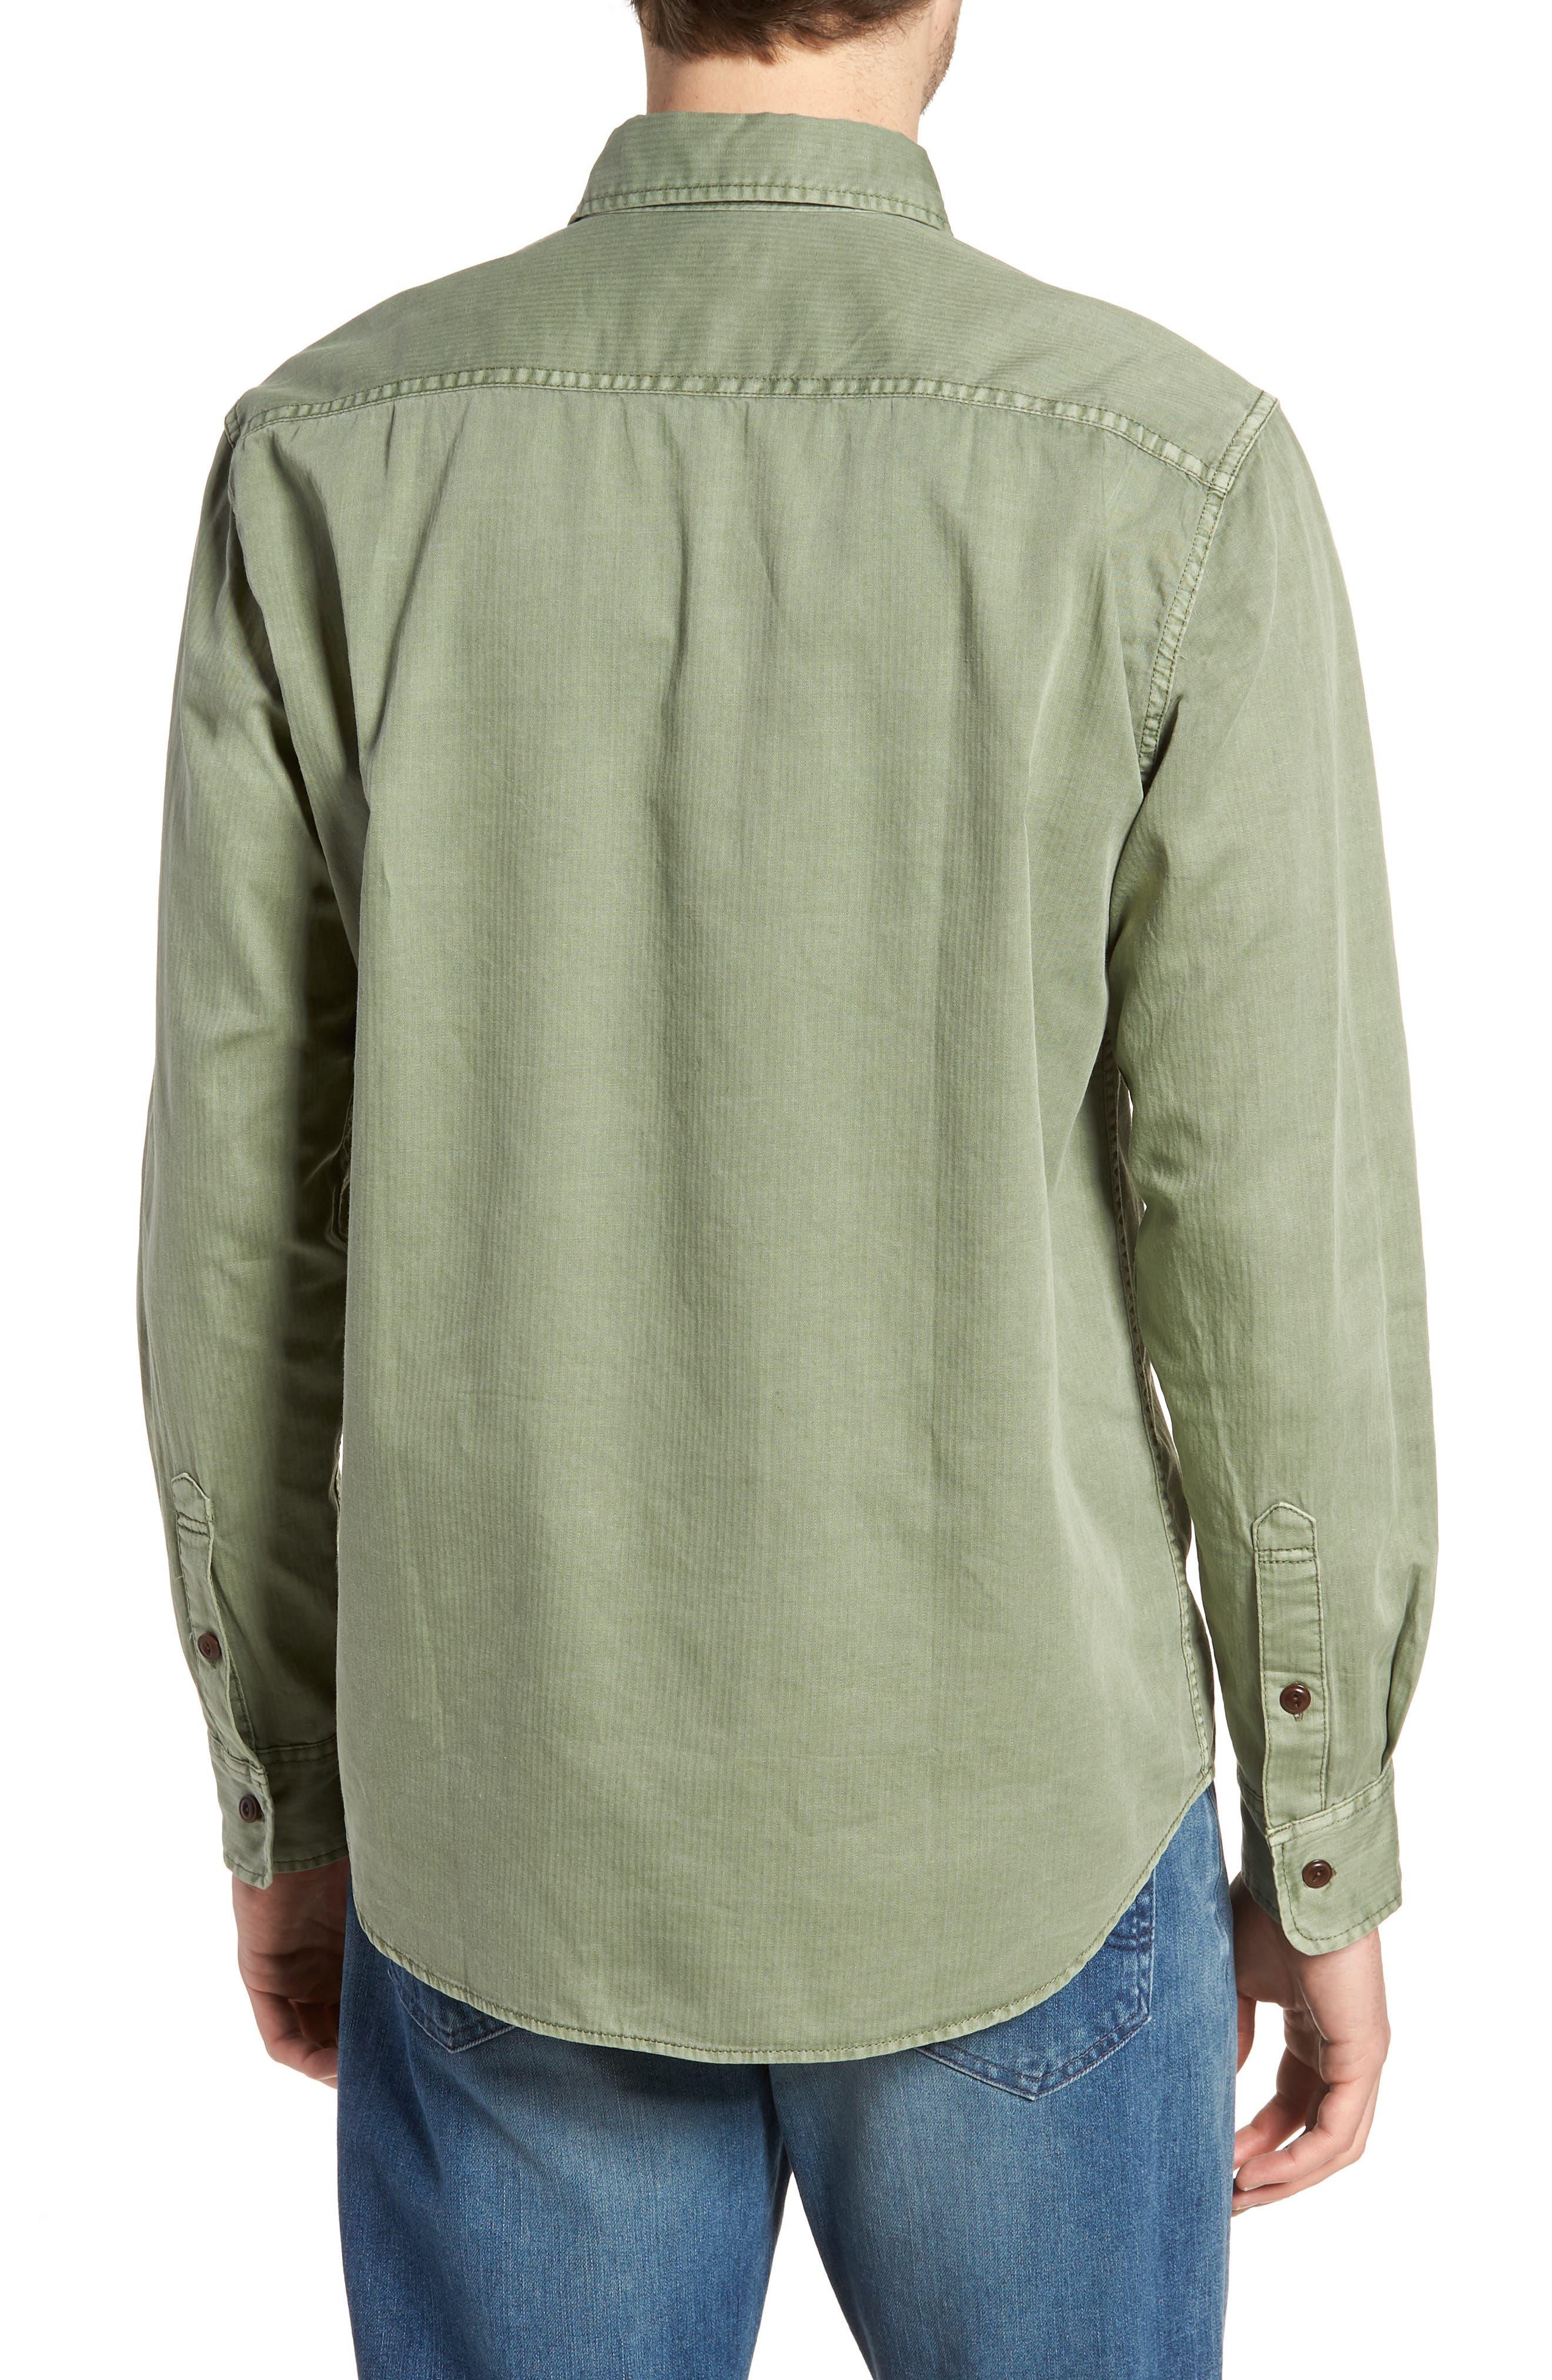 Radar Sport Shirt,                             Alternate thumbnail 2, color,                             Olive